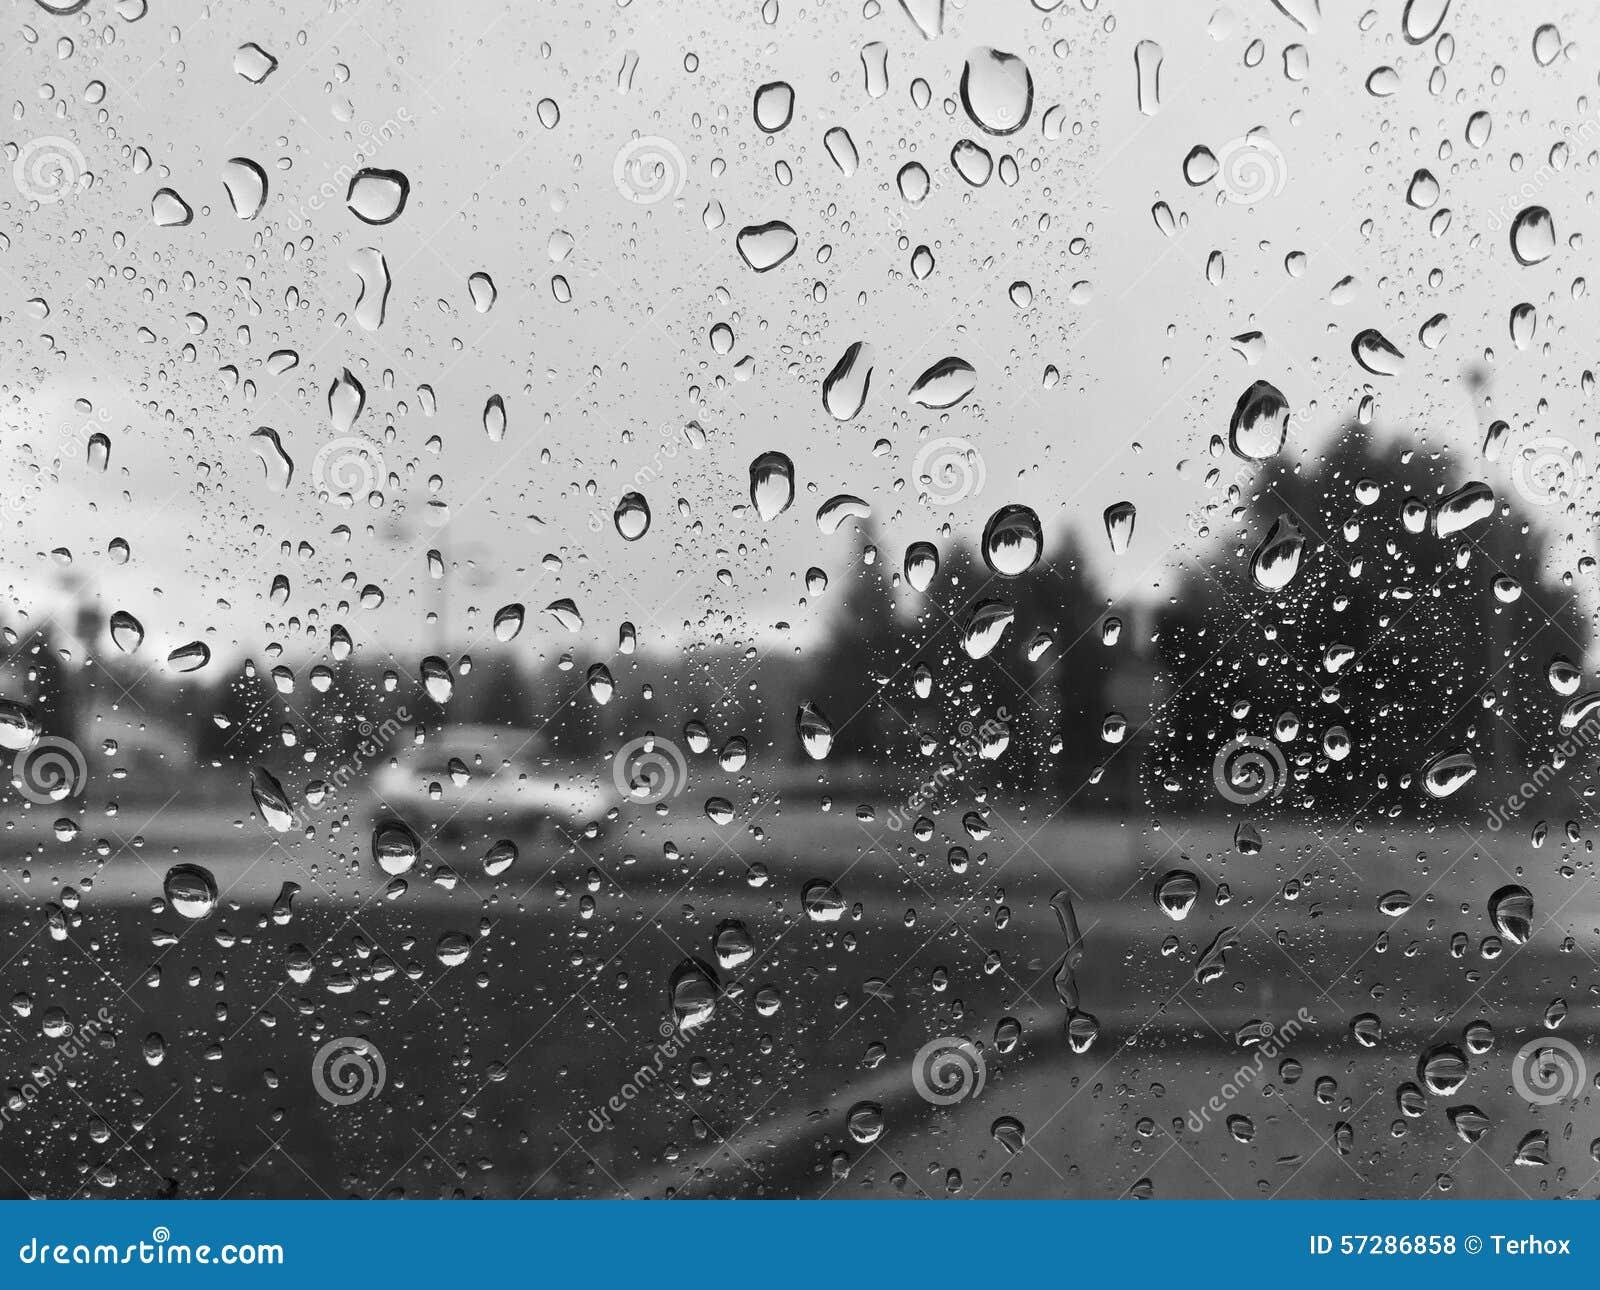 how to clean cloudy car windows